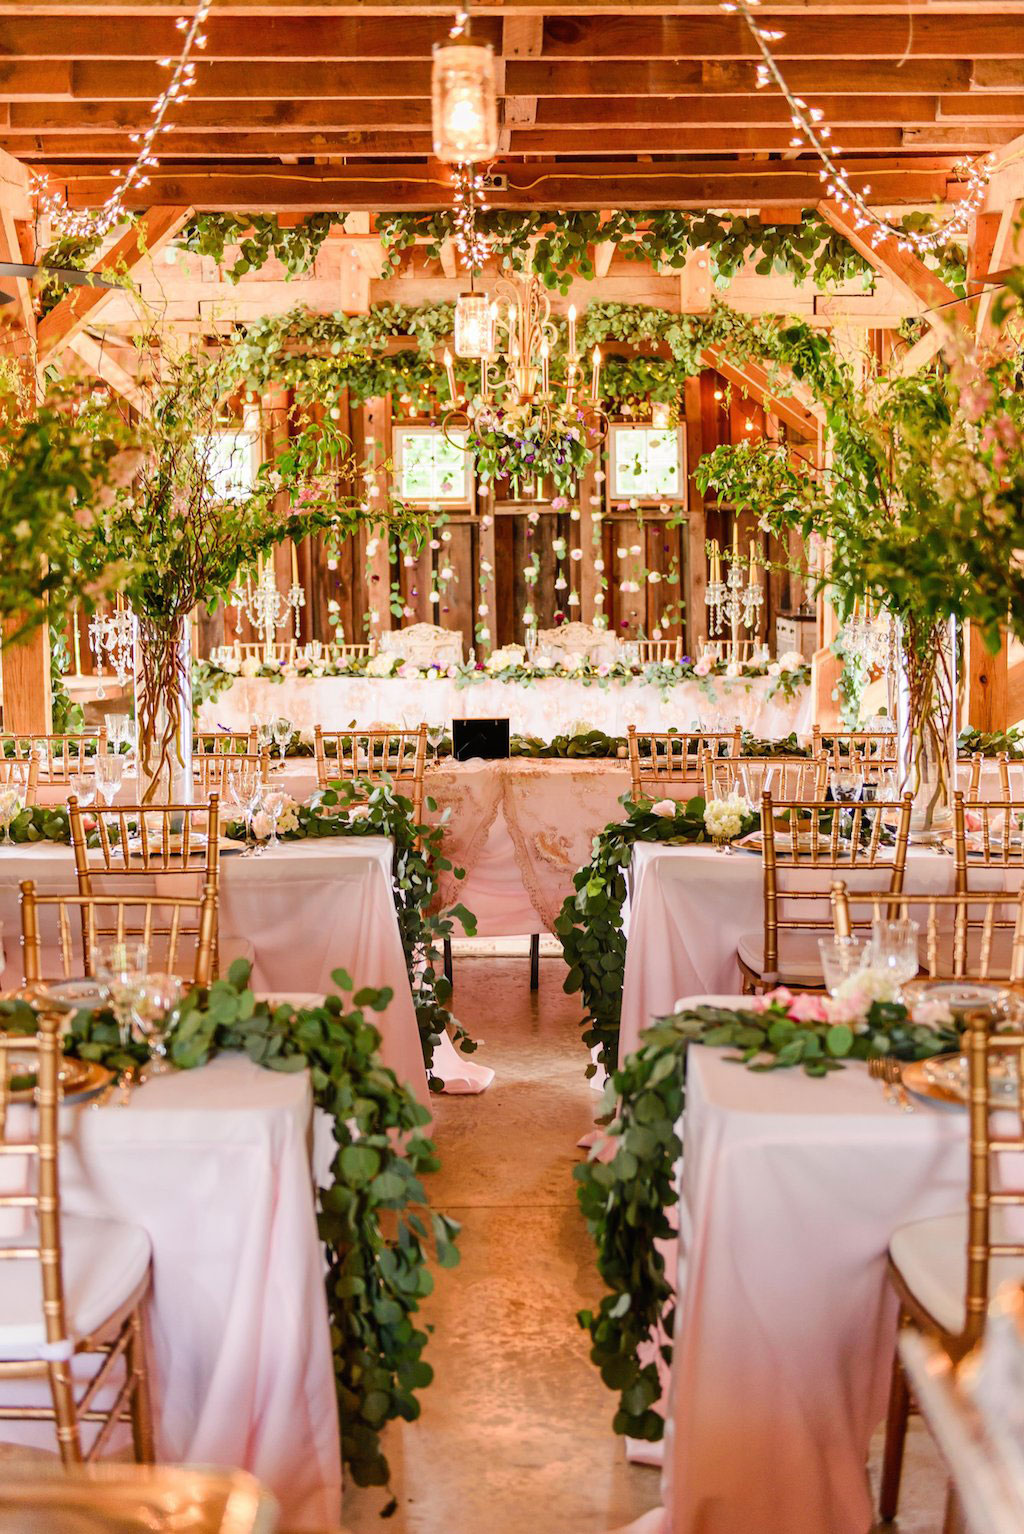 7-11-16-fairy-tale-barn-wedding-pink-blush-18